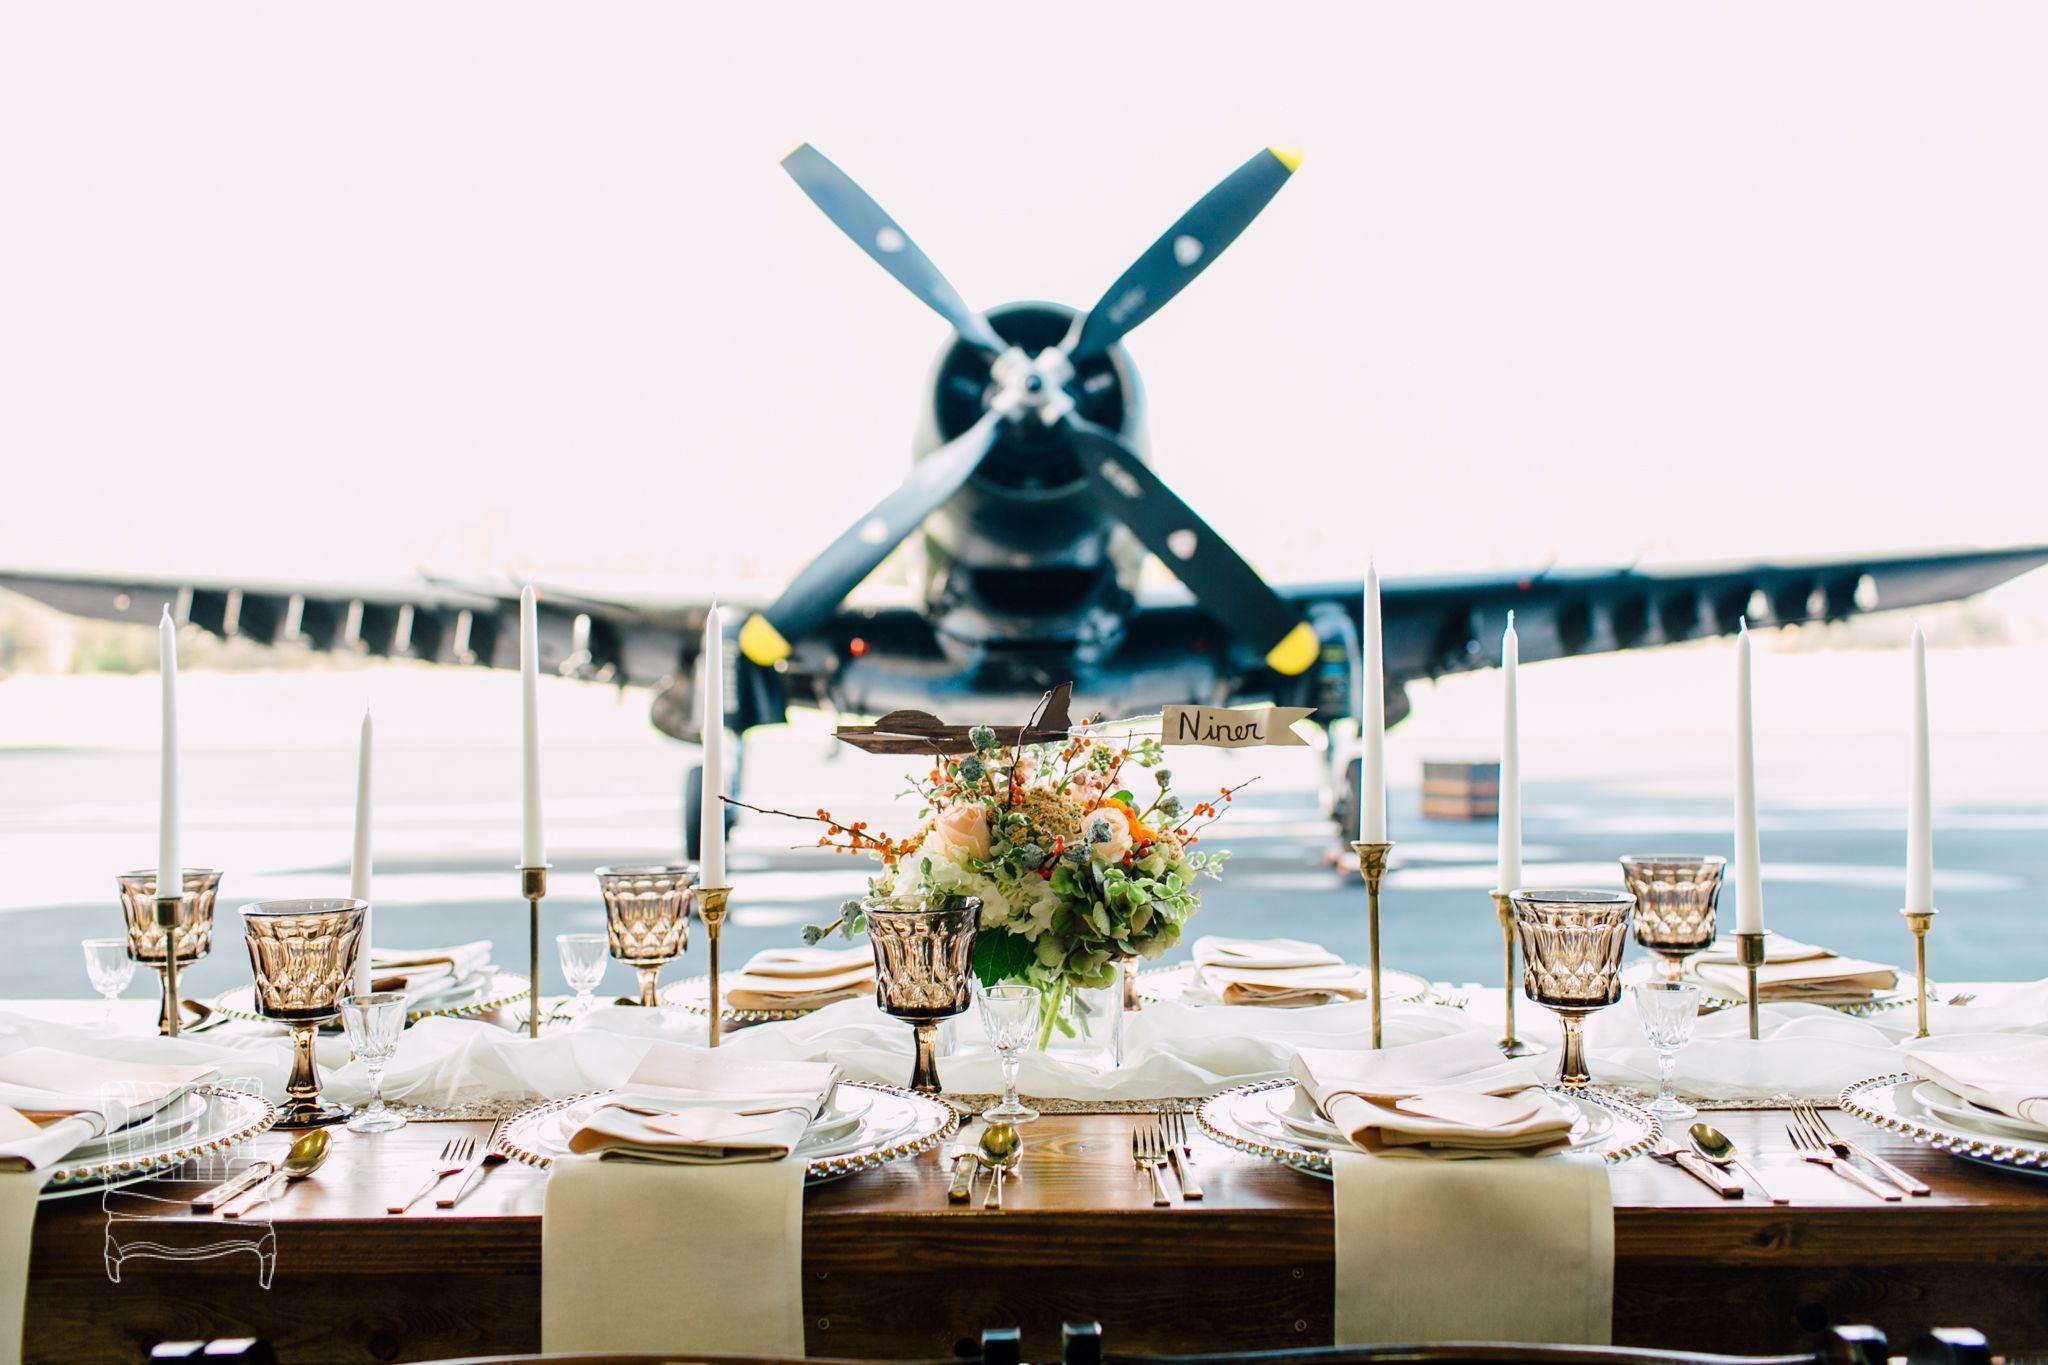 Champagne Nova Table Linens by Skagit Valley Wedding Rentals | Katy ...